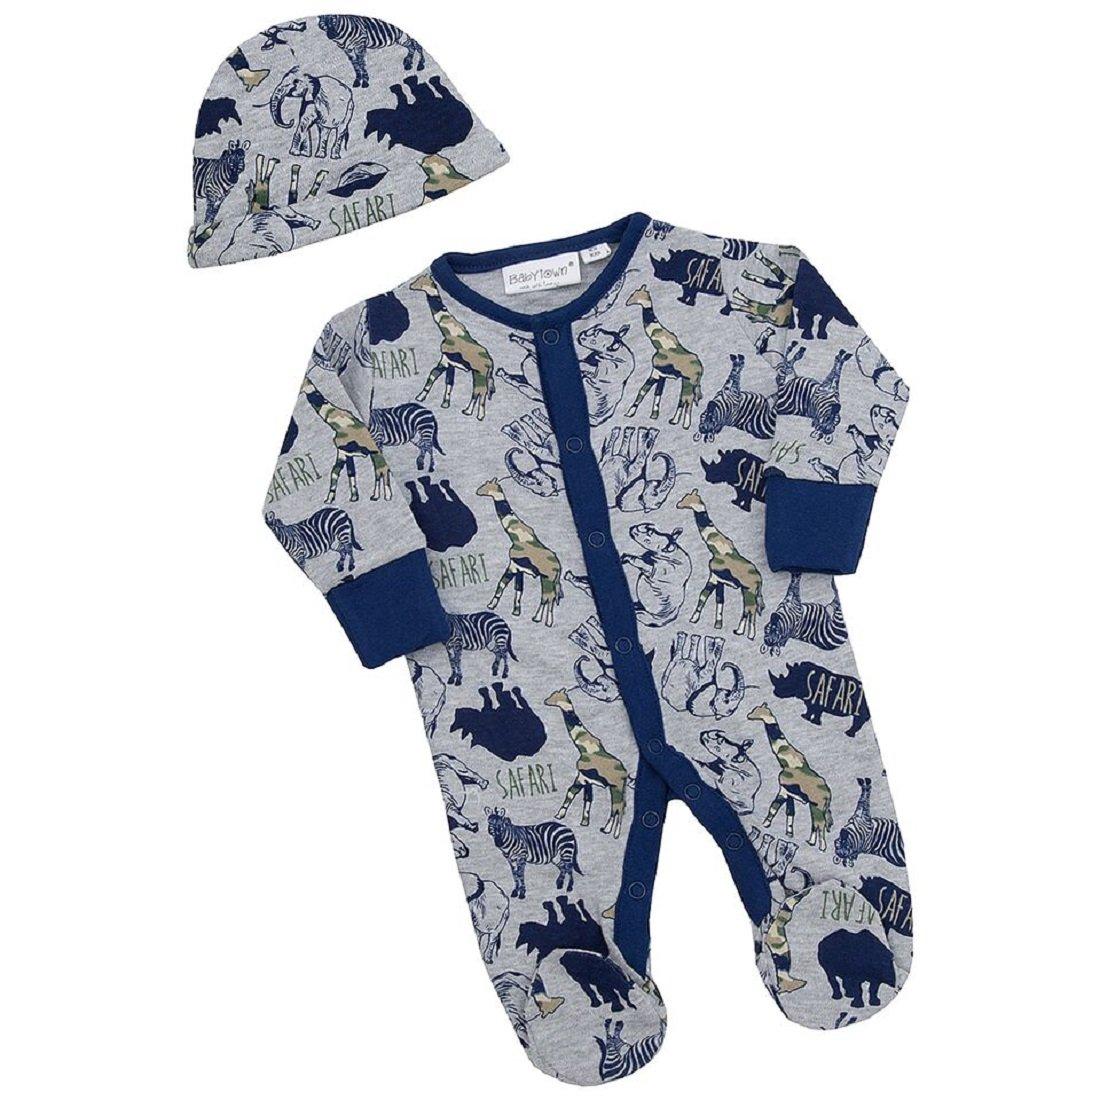 BABY TOWN Babies Sleepsuit/Babygro with Matching Hat Or Bib ~ Newborn - 9 Months